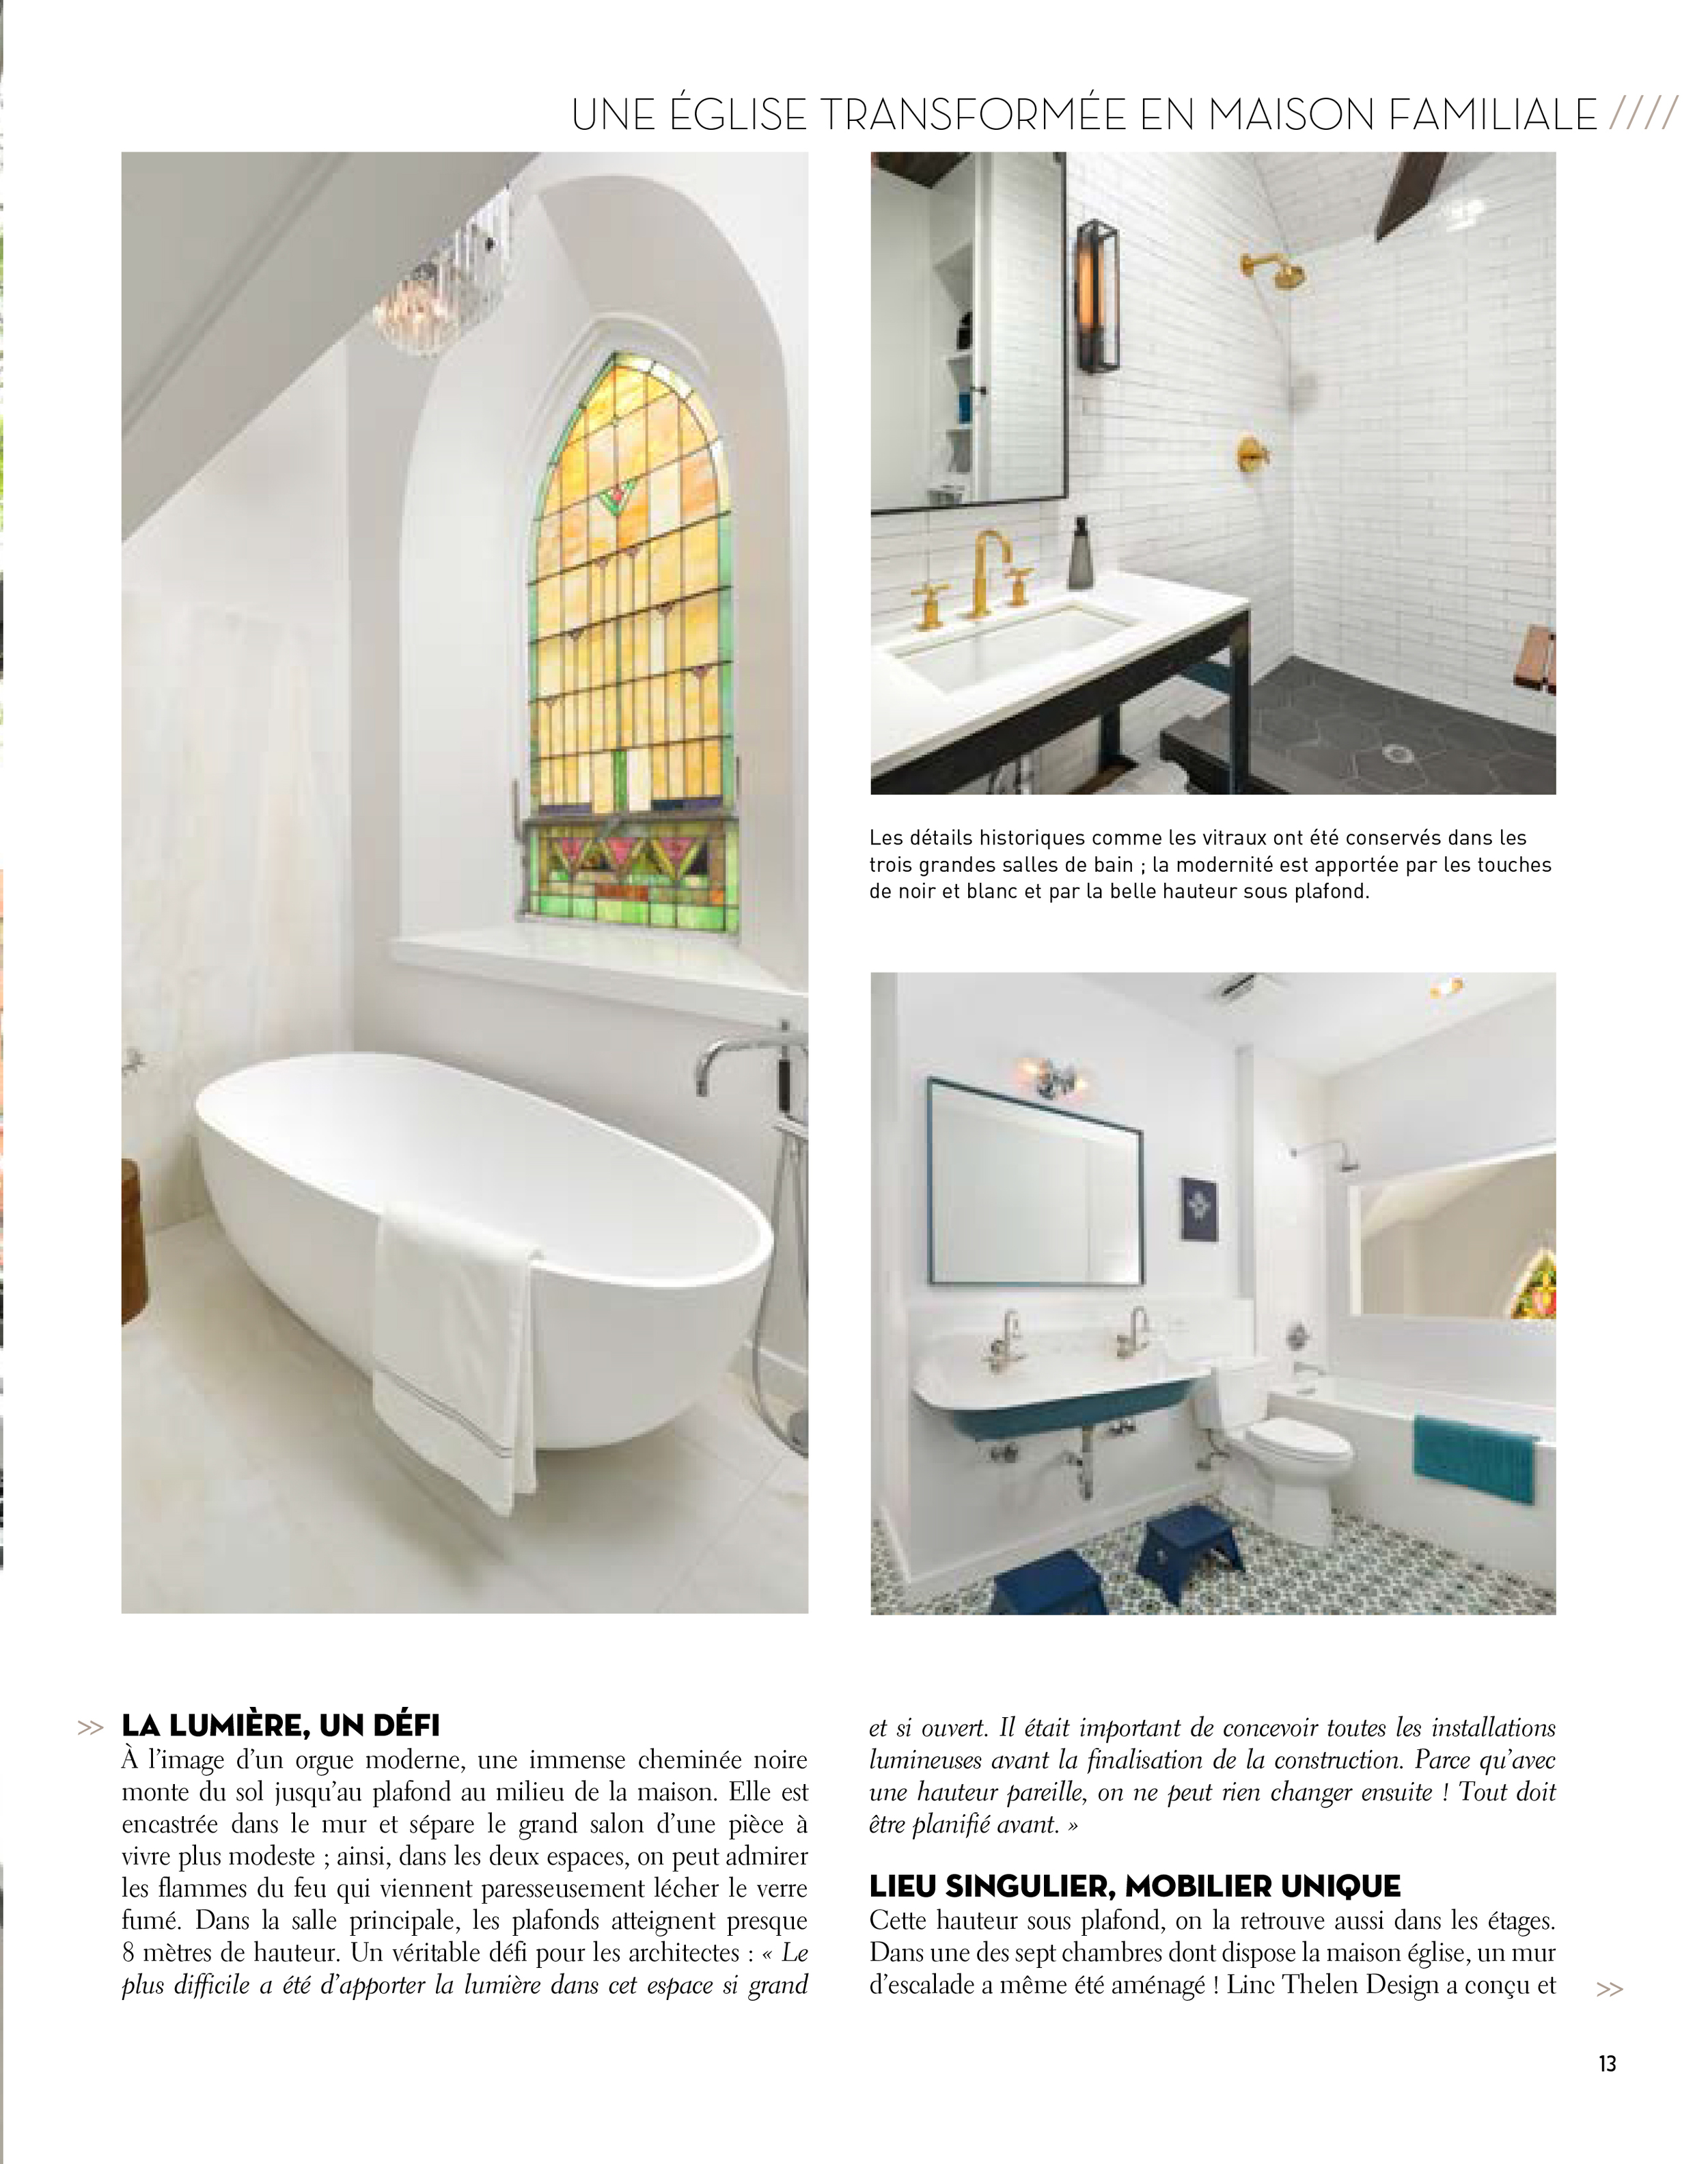 Business Plan Salle D Escalade press — lincthelendesign